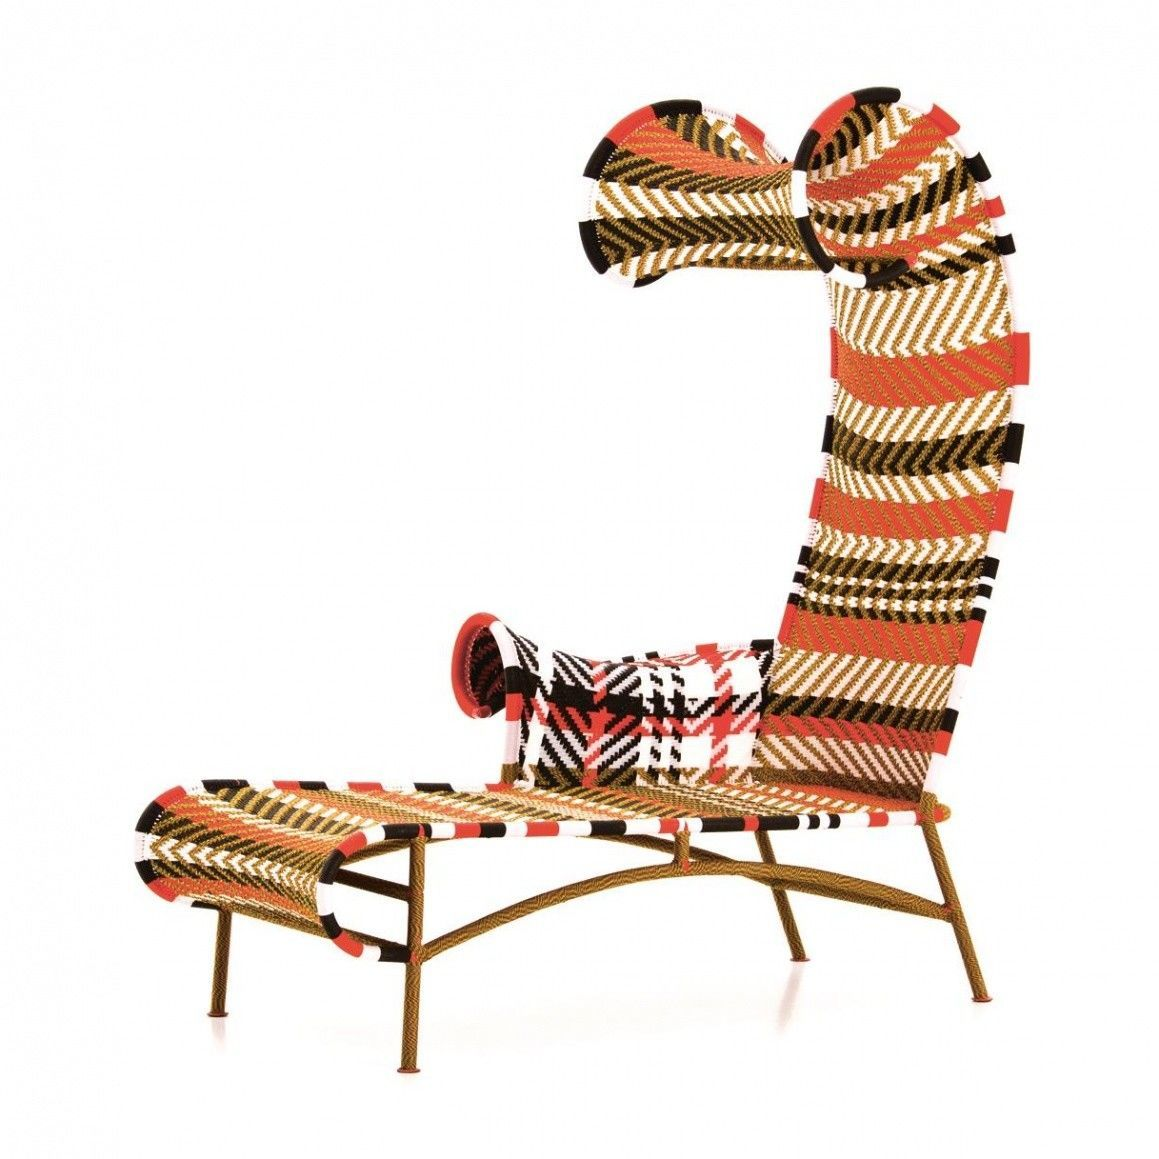 Shadowy chaise longue moroso for Chaise 66 alvar aalto